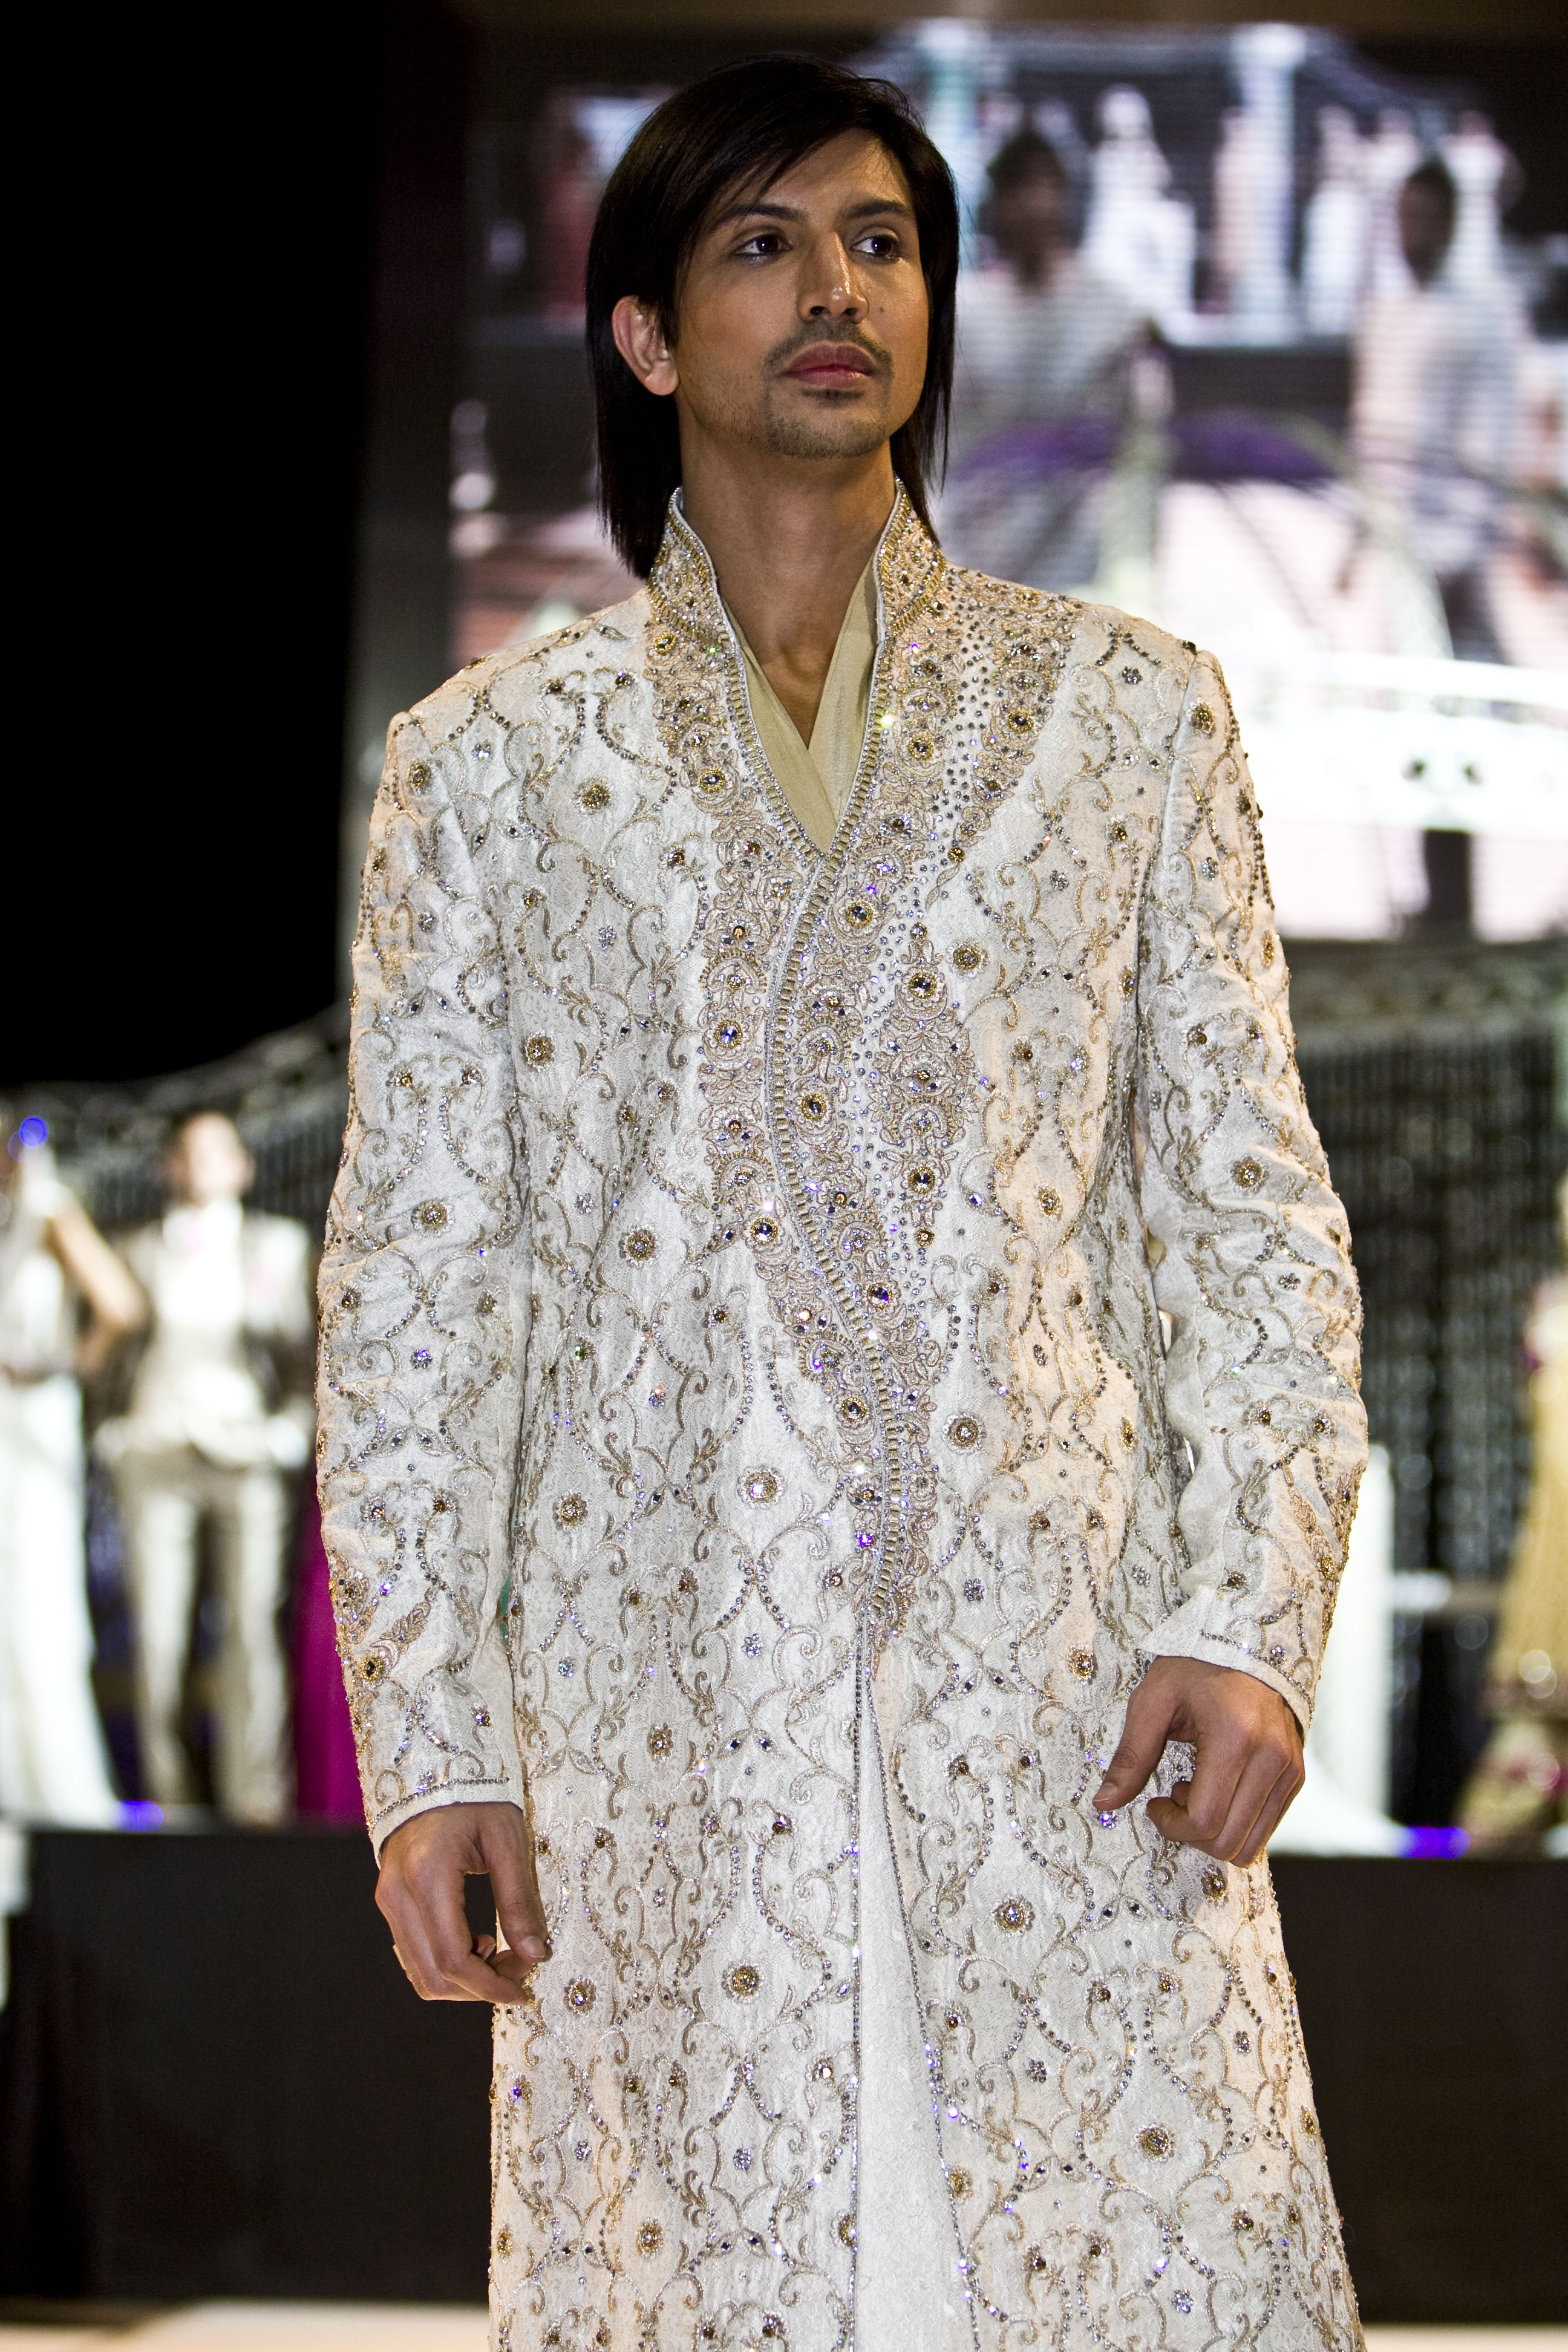 Sherwani sherwanis asianweddingsuits groom indian clothes